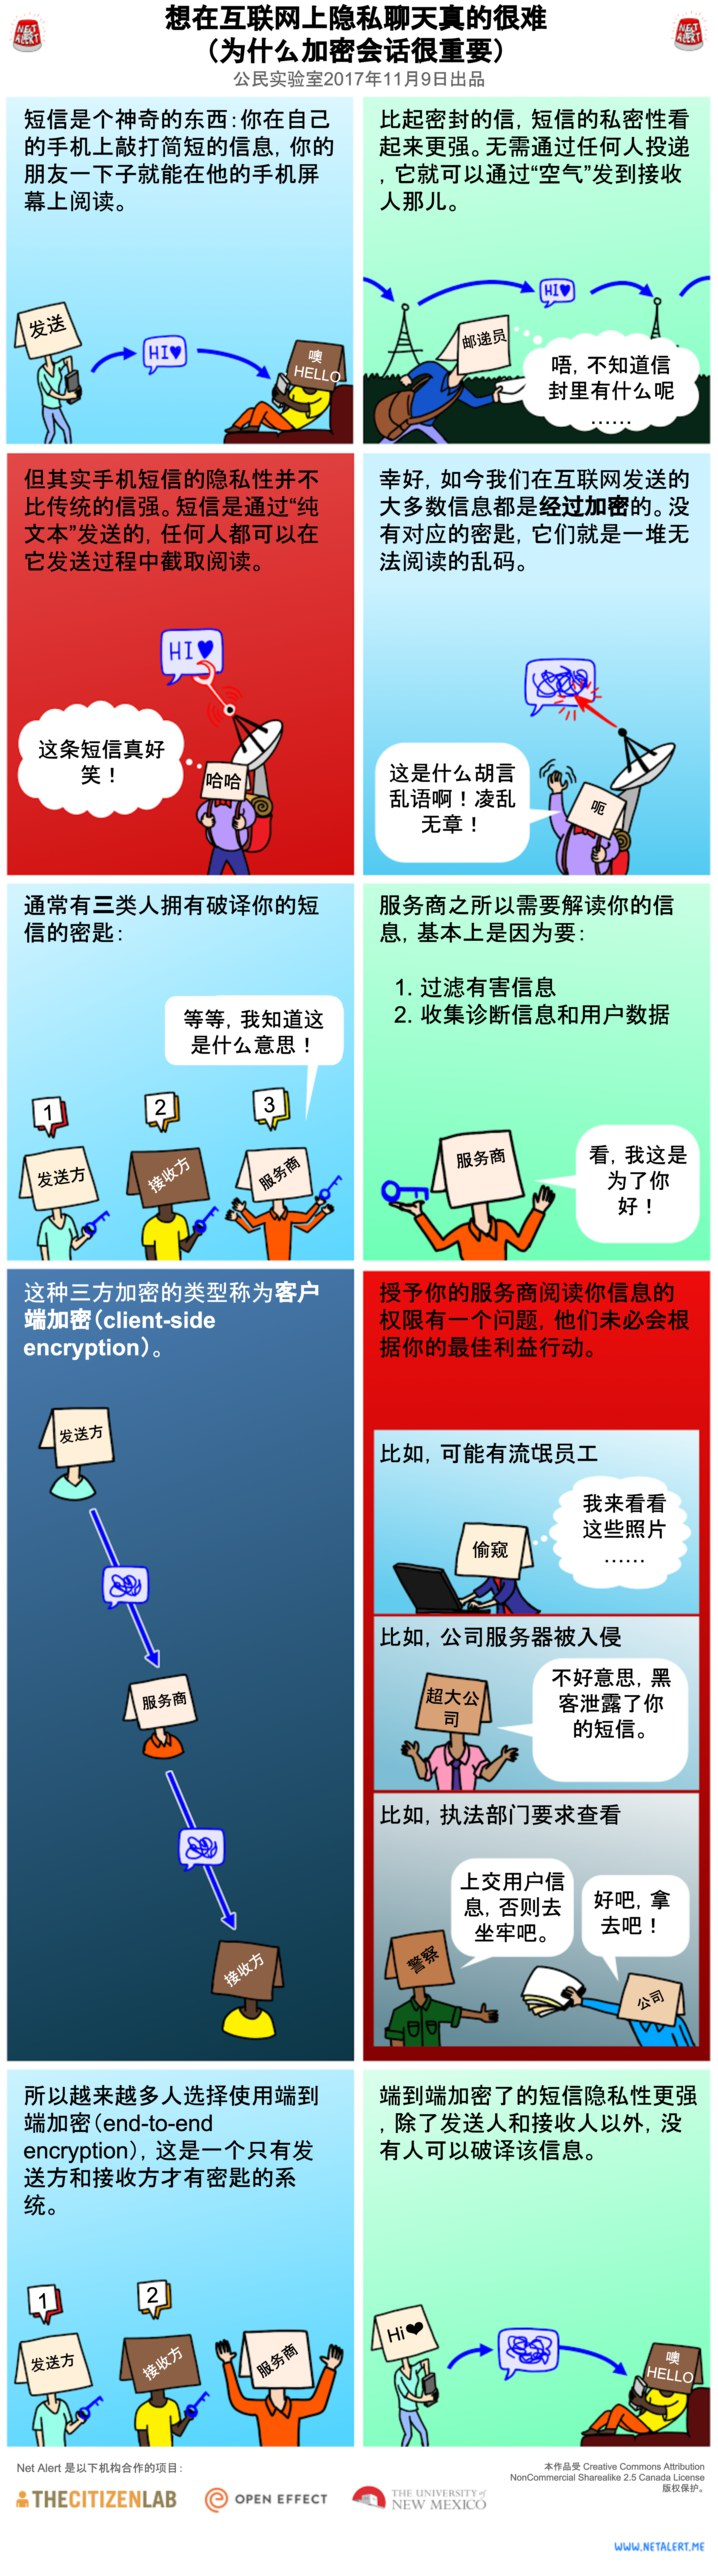 Net Alert | 保障會話安全